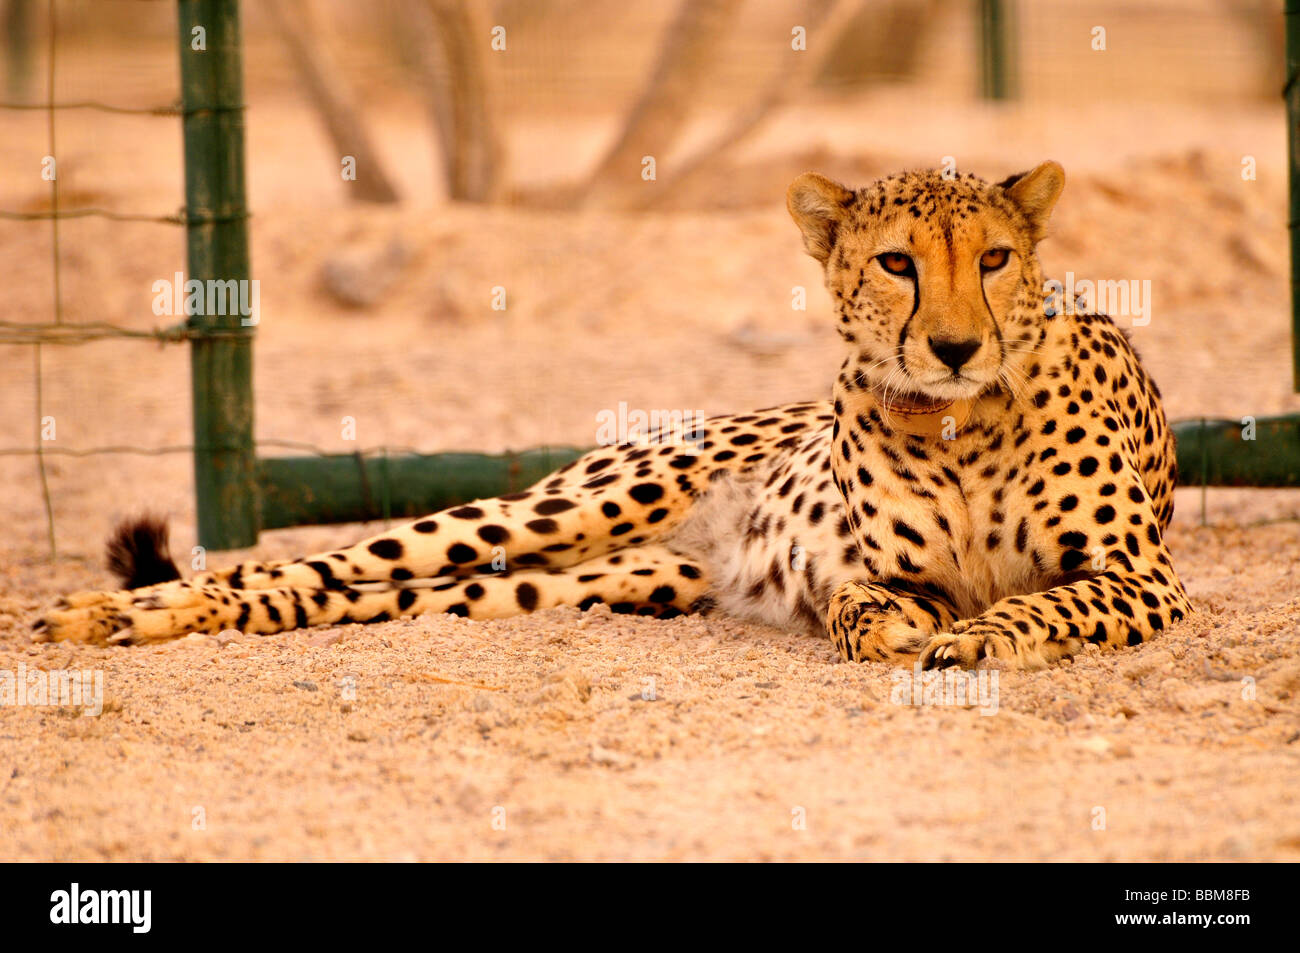 Gepard (Acinonyx Jubatus Soemmerring) in ein Vivarium, Sir Bani Yas Island, Abu Dhabi, Vereinigte Arabische Emirate, Stockbild